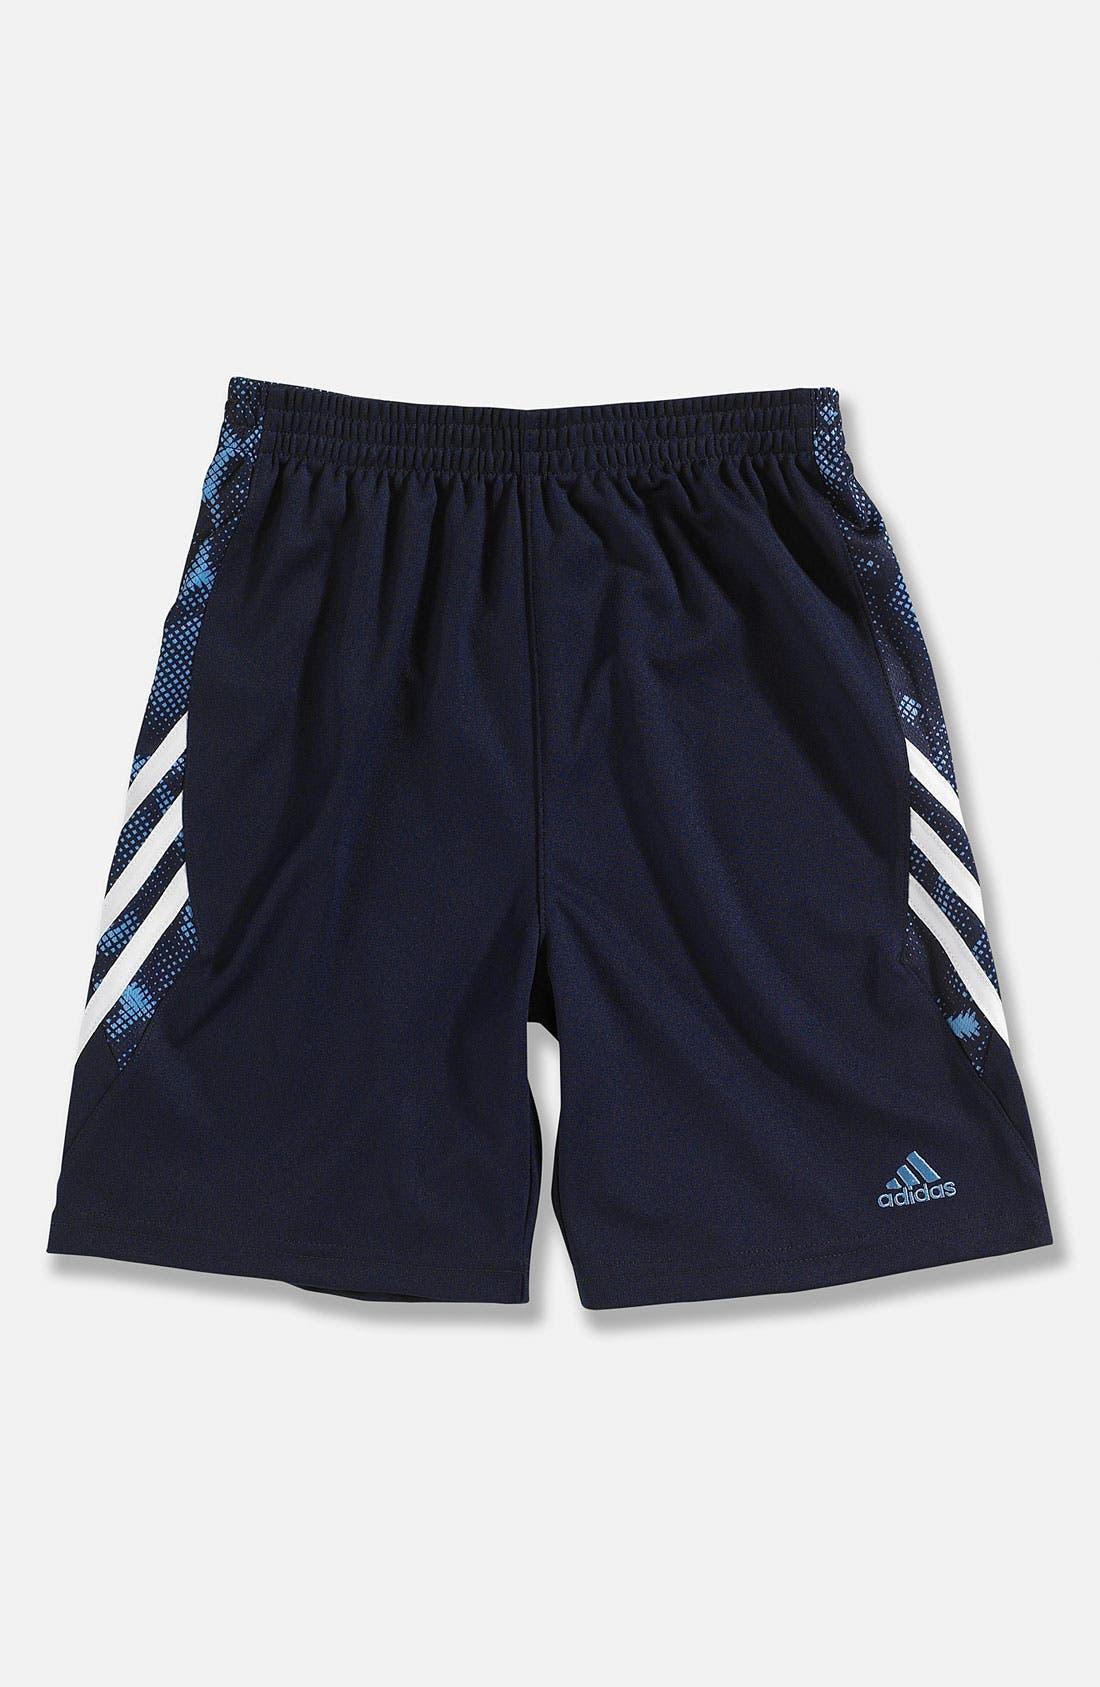 Main Image - adidas 'Lethal' Shorts (Little Boys)